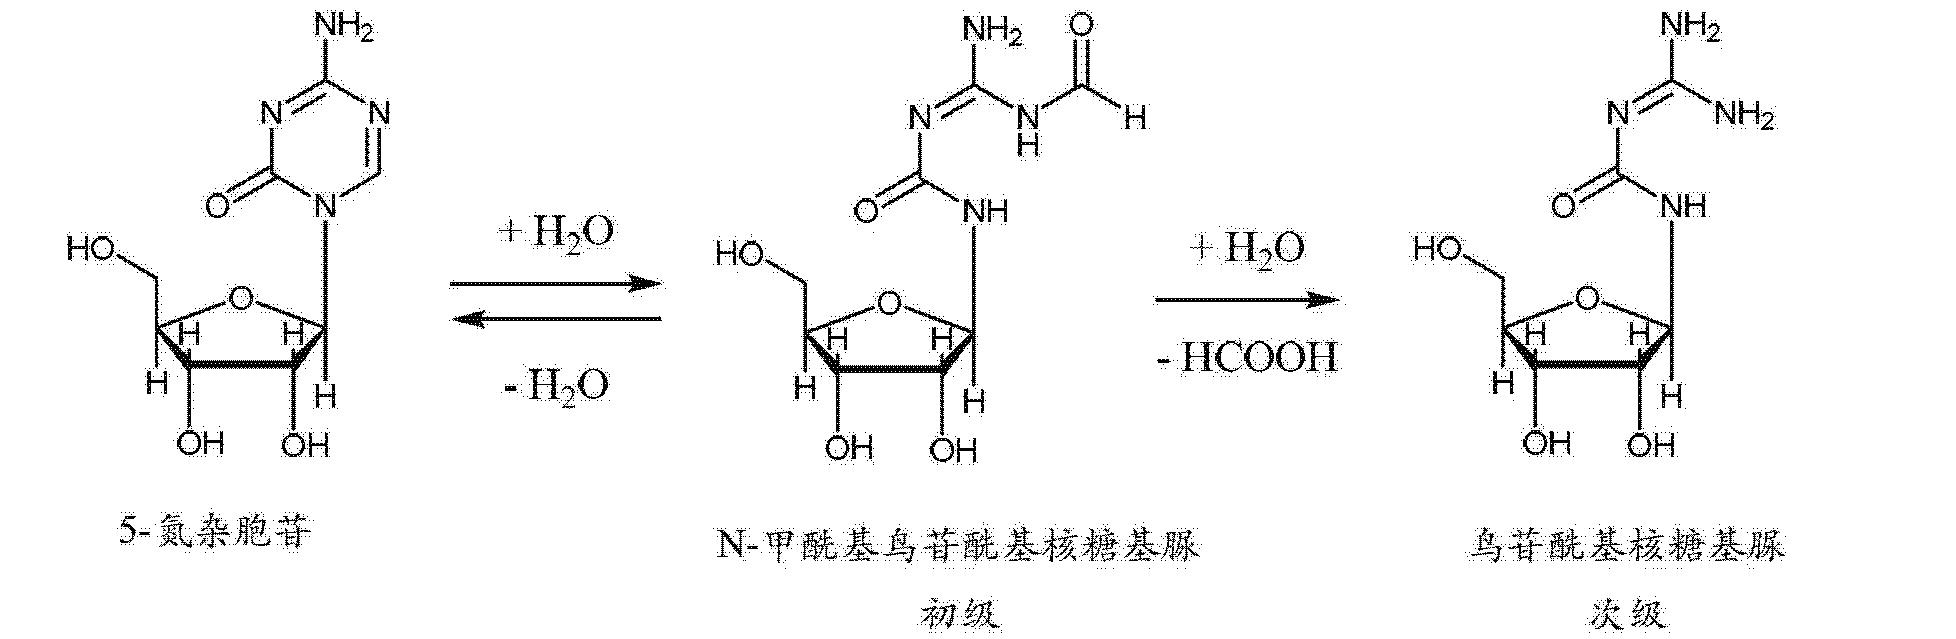 Figure CN103338753AD00601